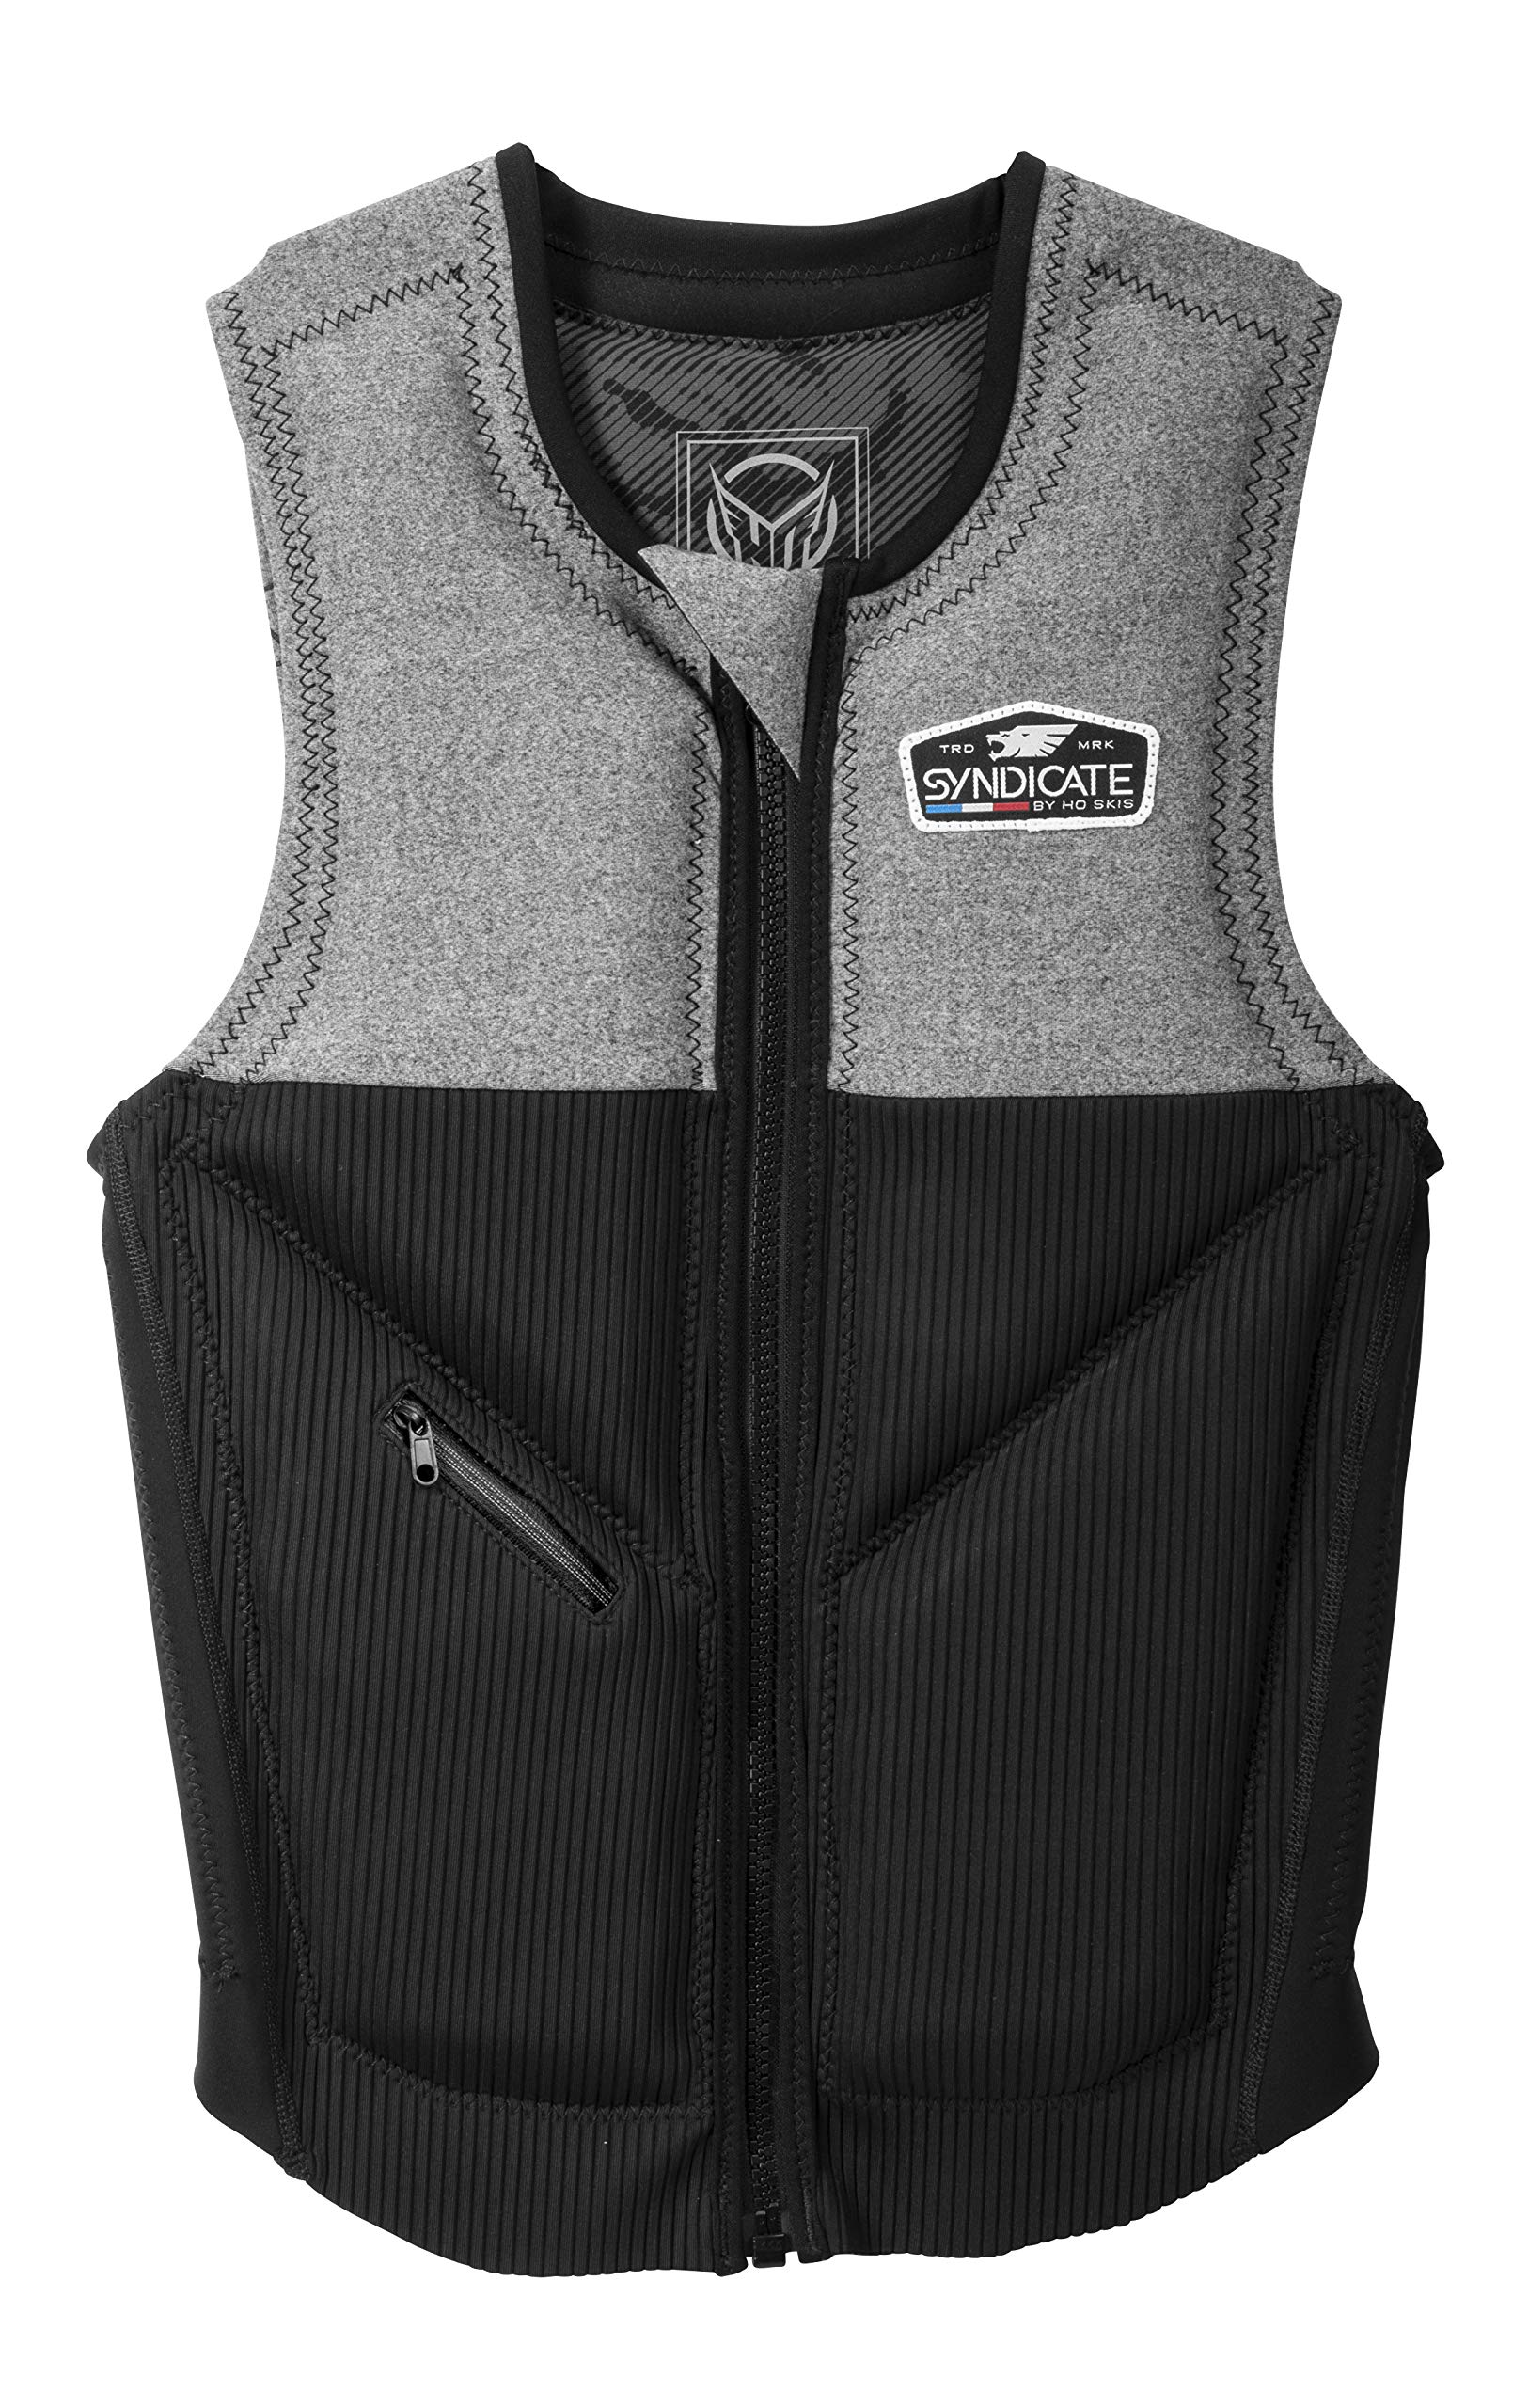 HO Sports 2019 NCGA Syndicate Legend Competition Ski Wakeboard Wakesurf Vest Jacket XL